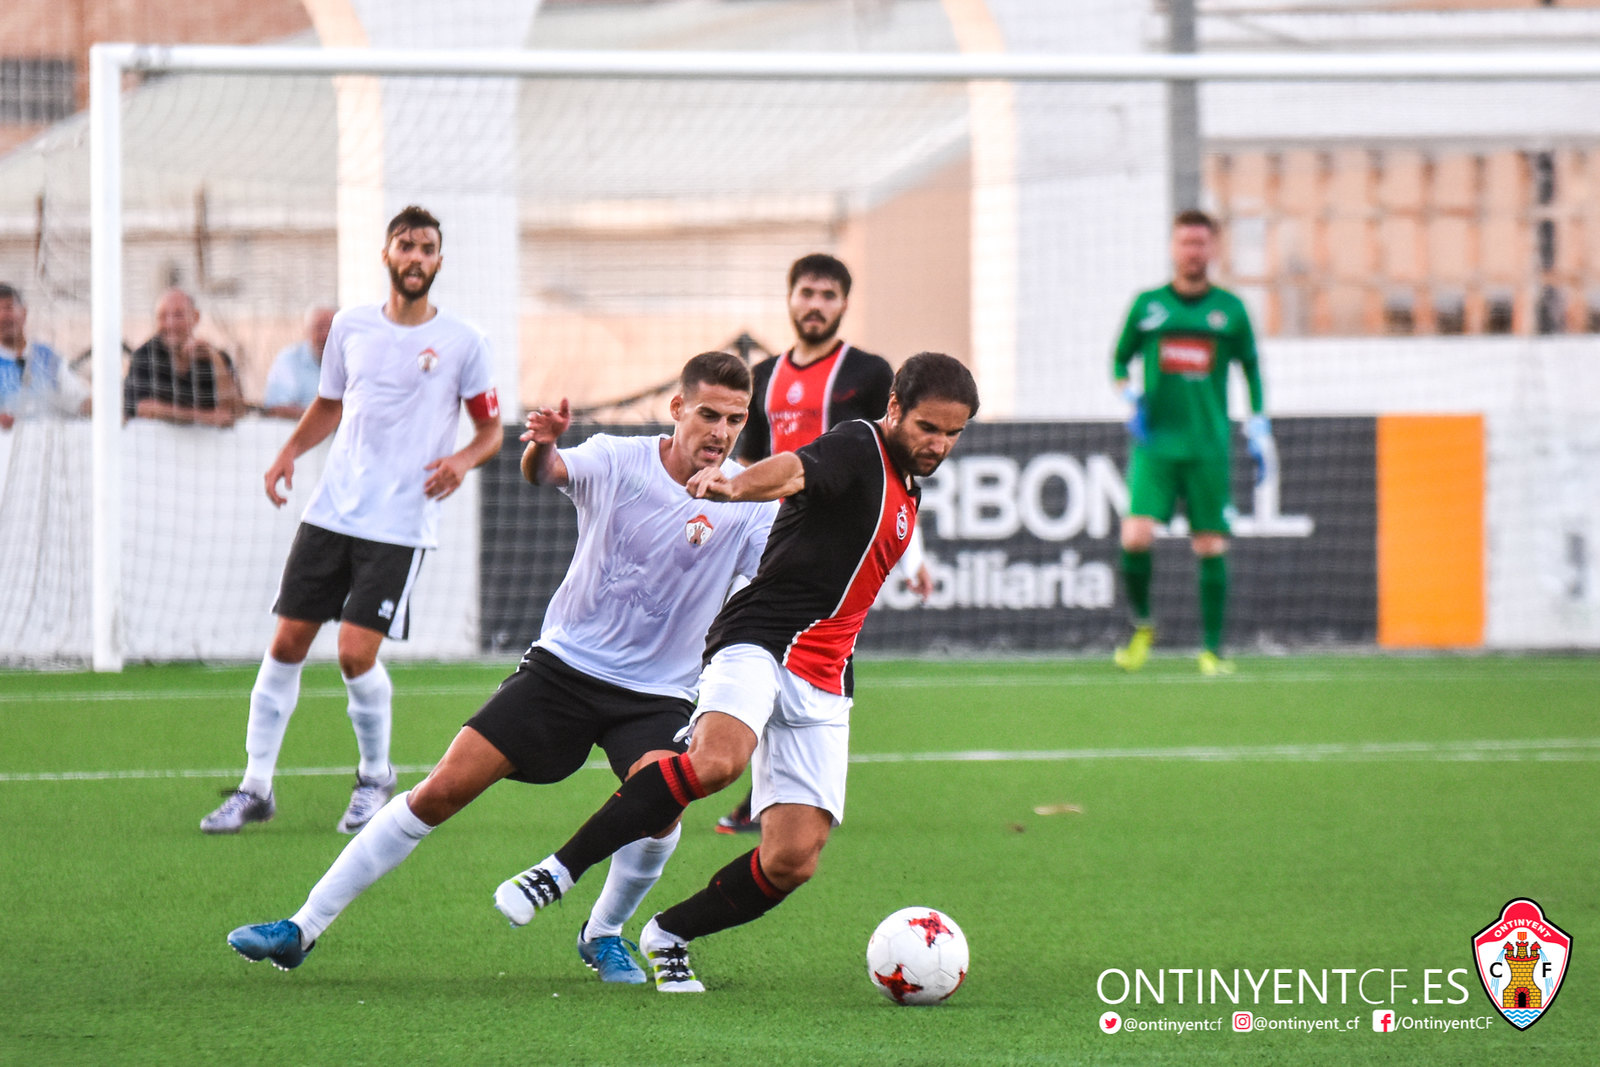 Ontinyent CF AD Unión Adarve